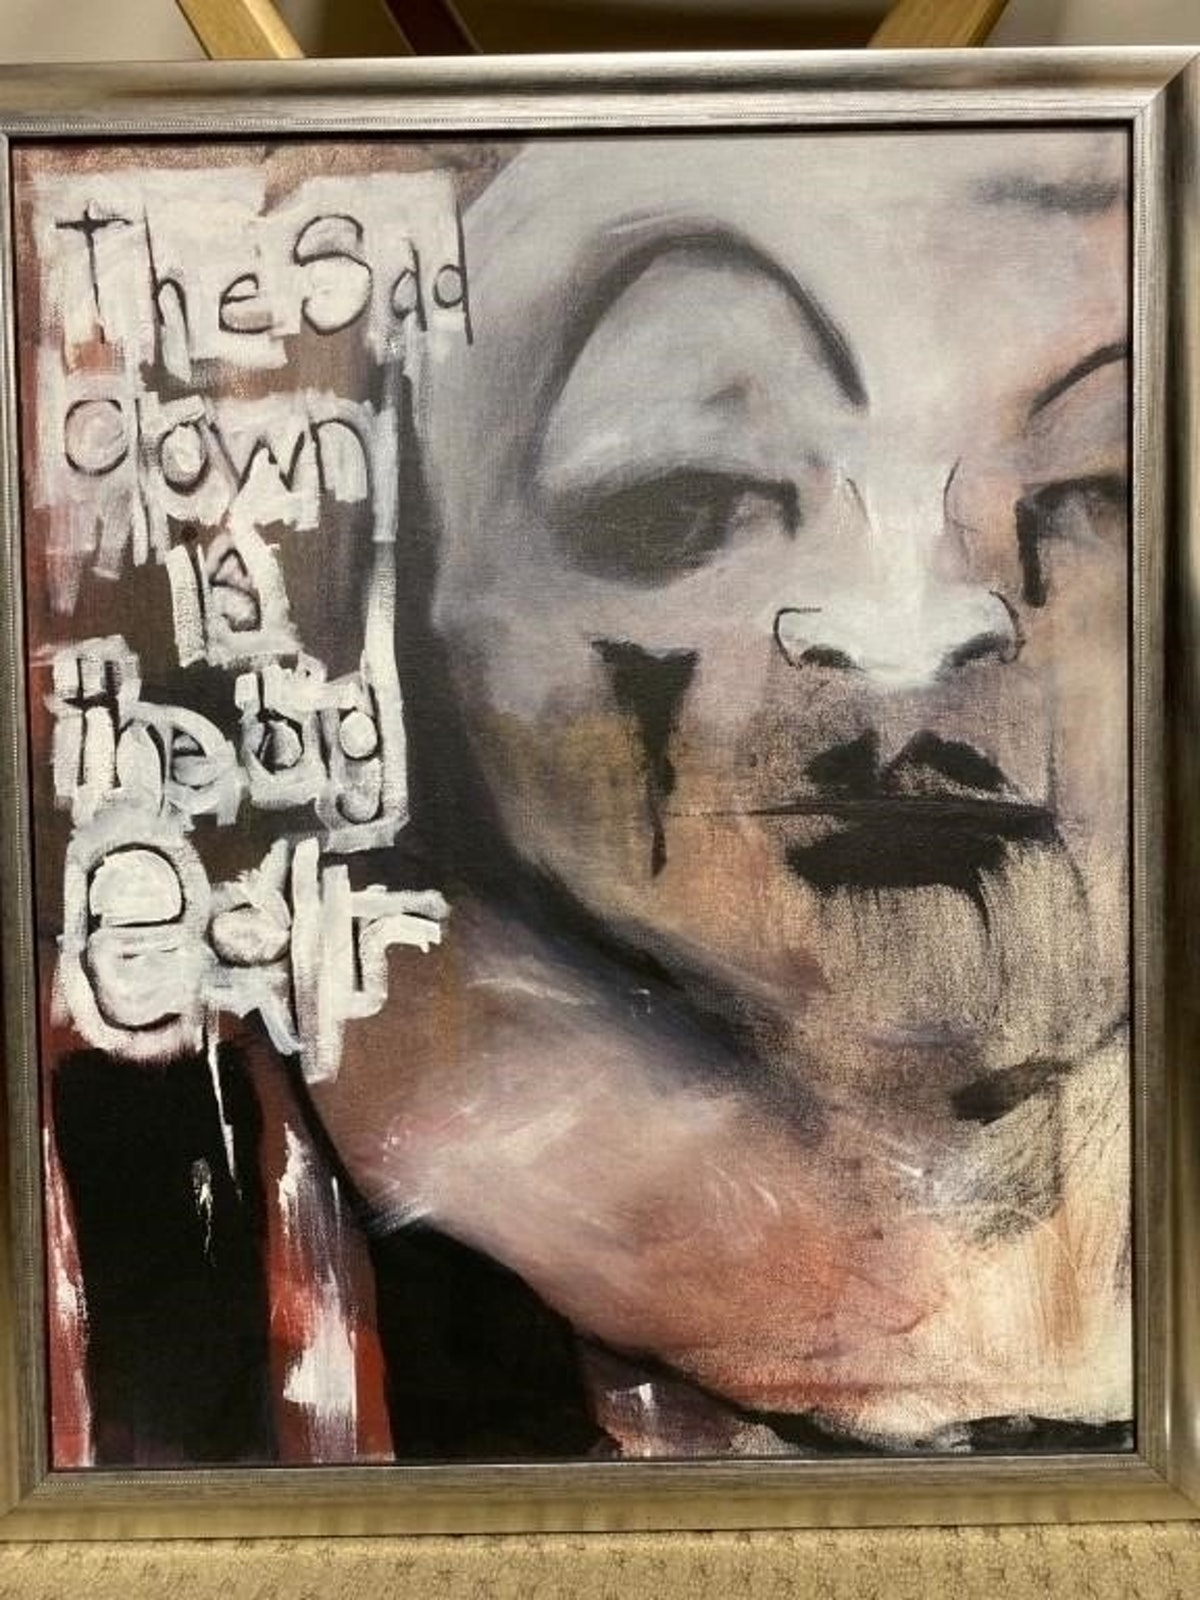 Framed artwork of a sad clown.